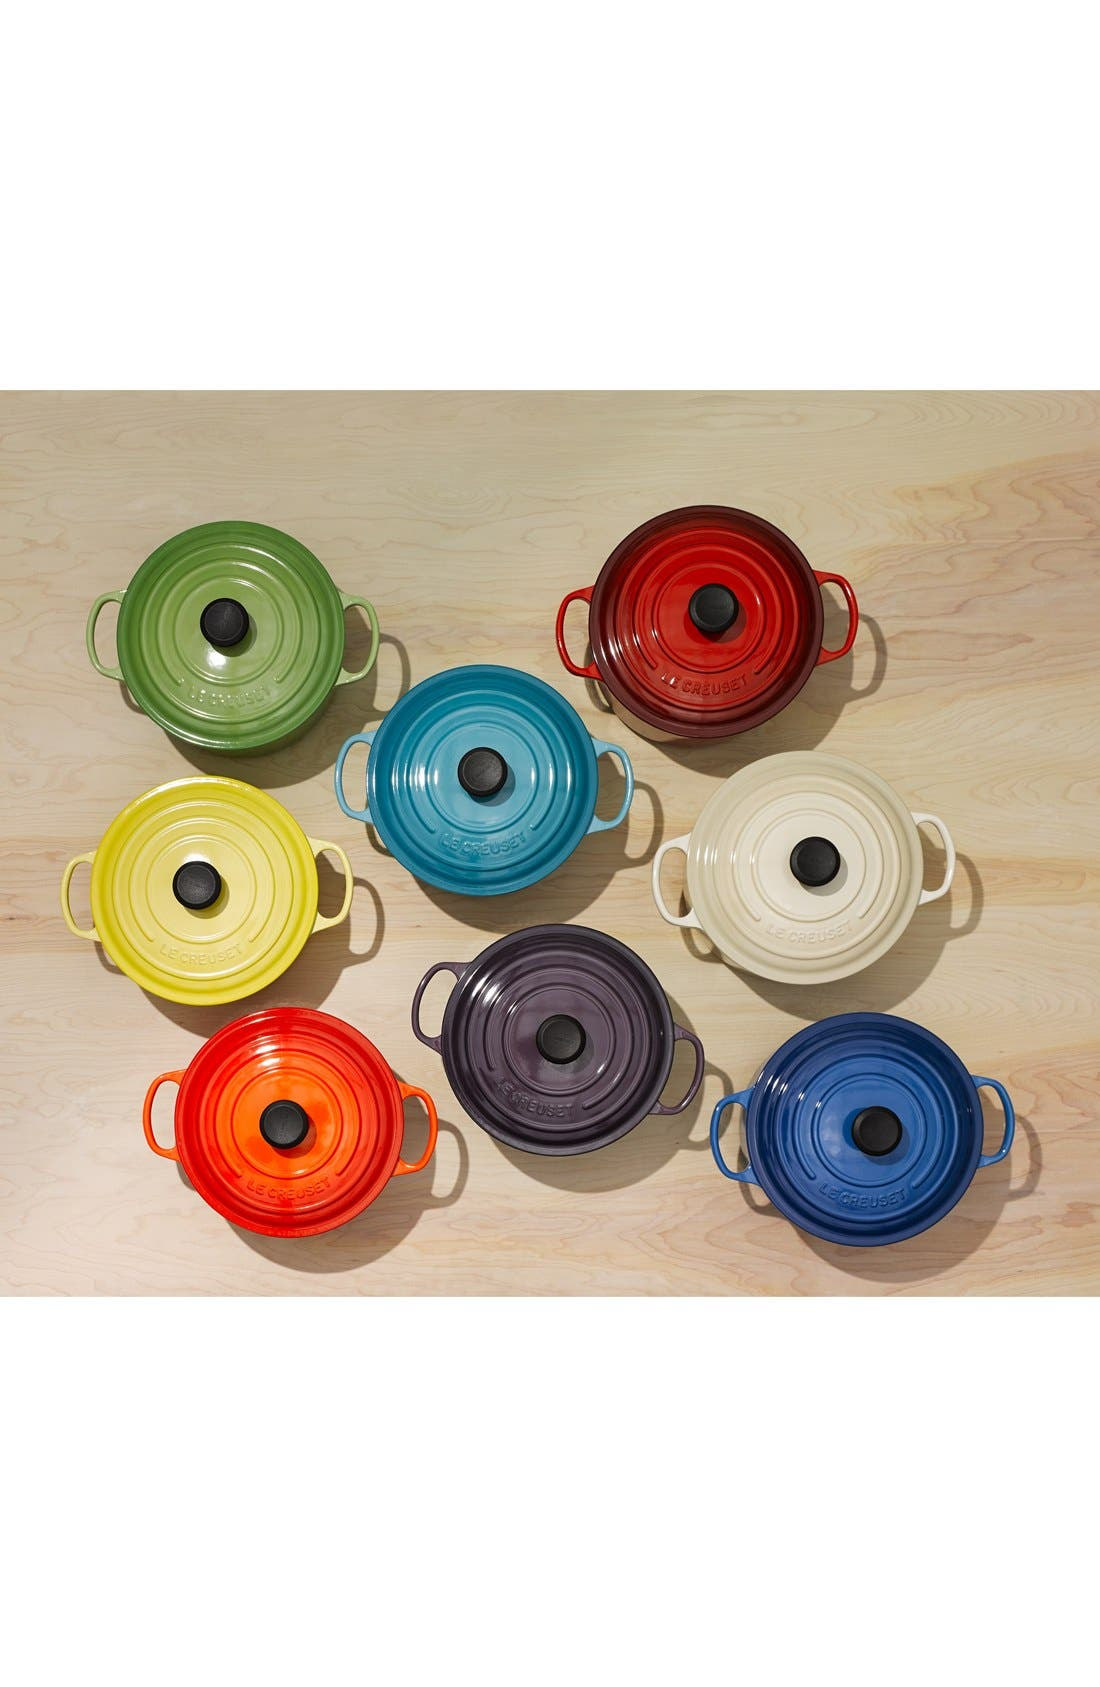 LE CREUSET,                             Signature 5 1/2 Quart Round Enamel Cast Iron French/Dutch Oven,                             Alternate thumbnail 5, color,                             INDIGO